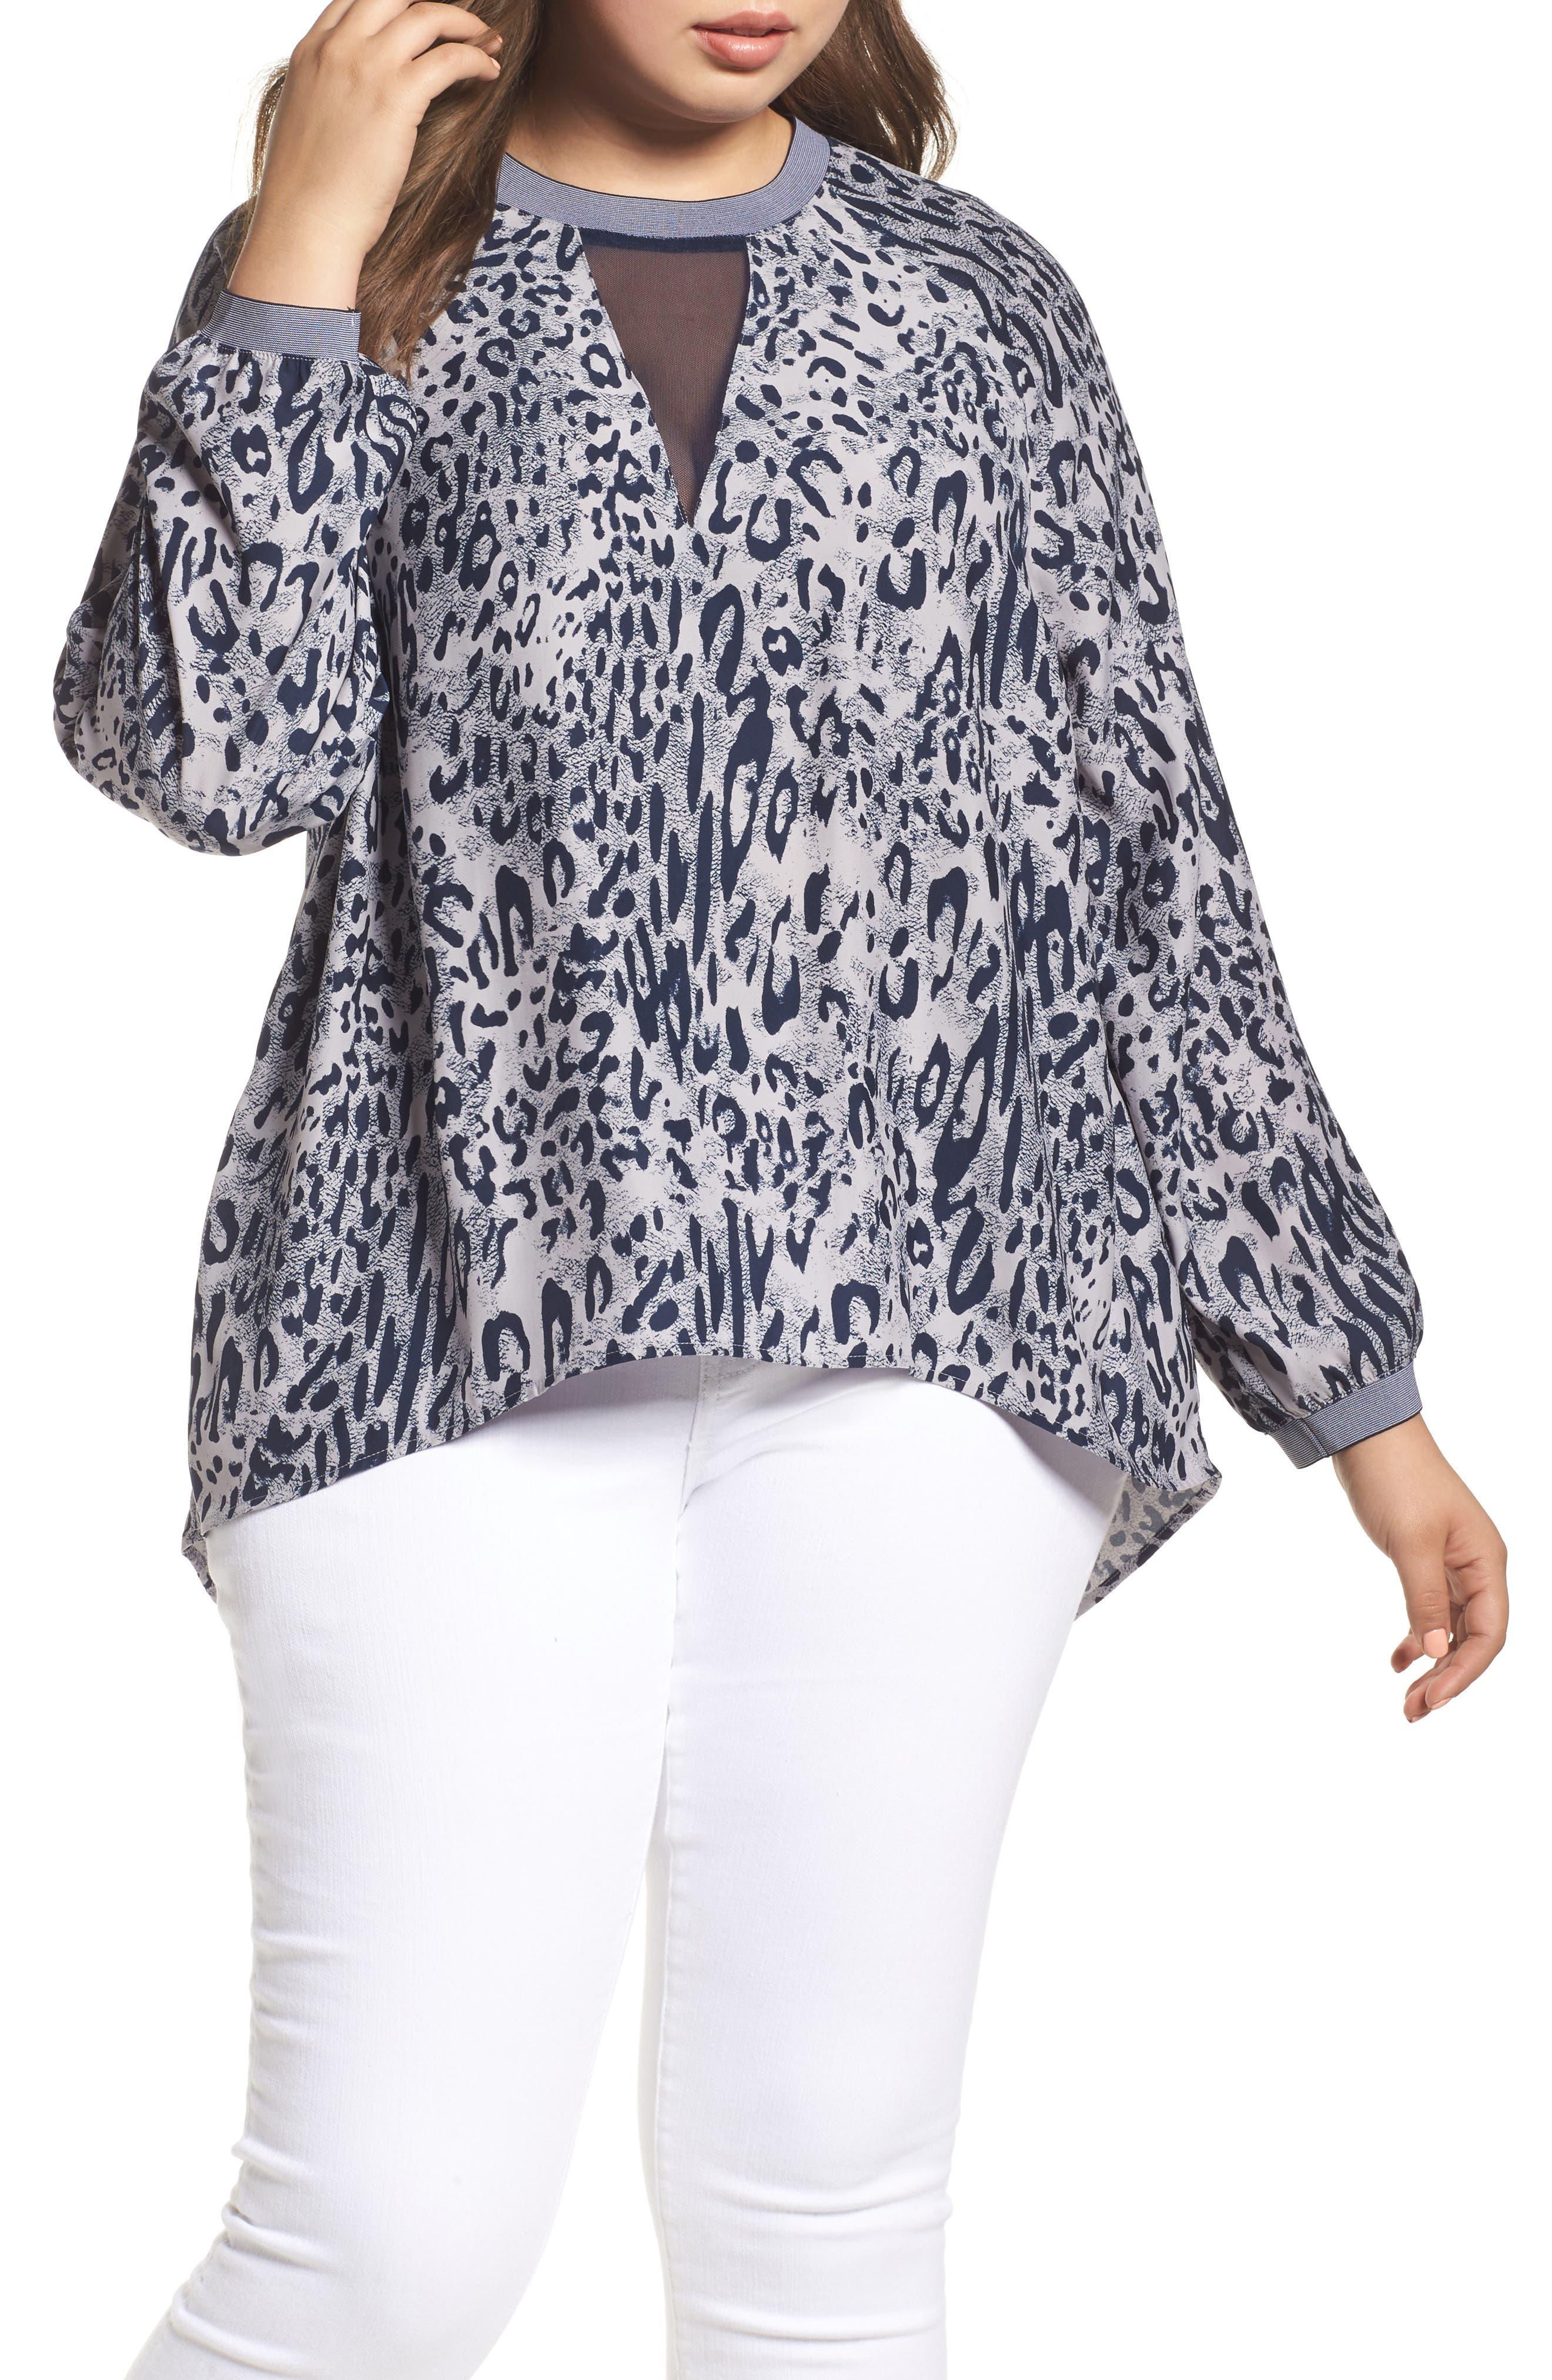 Alternate Image 1 Selected - Melissa McCarthy Seven7 Leopard Print Raglan Blouse (Plus Size)